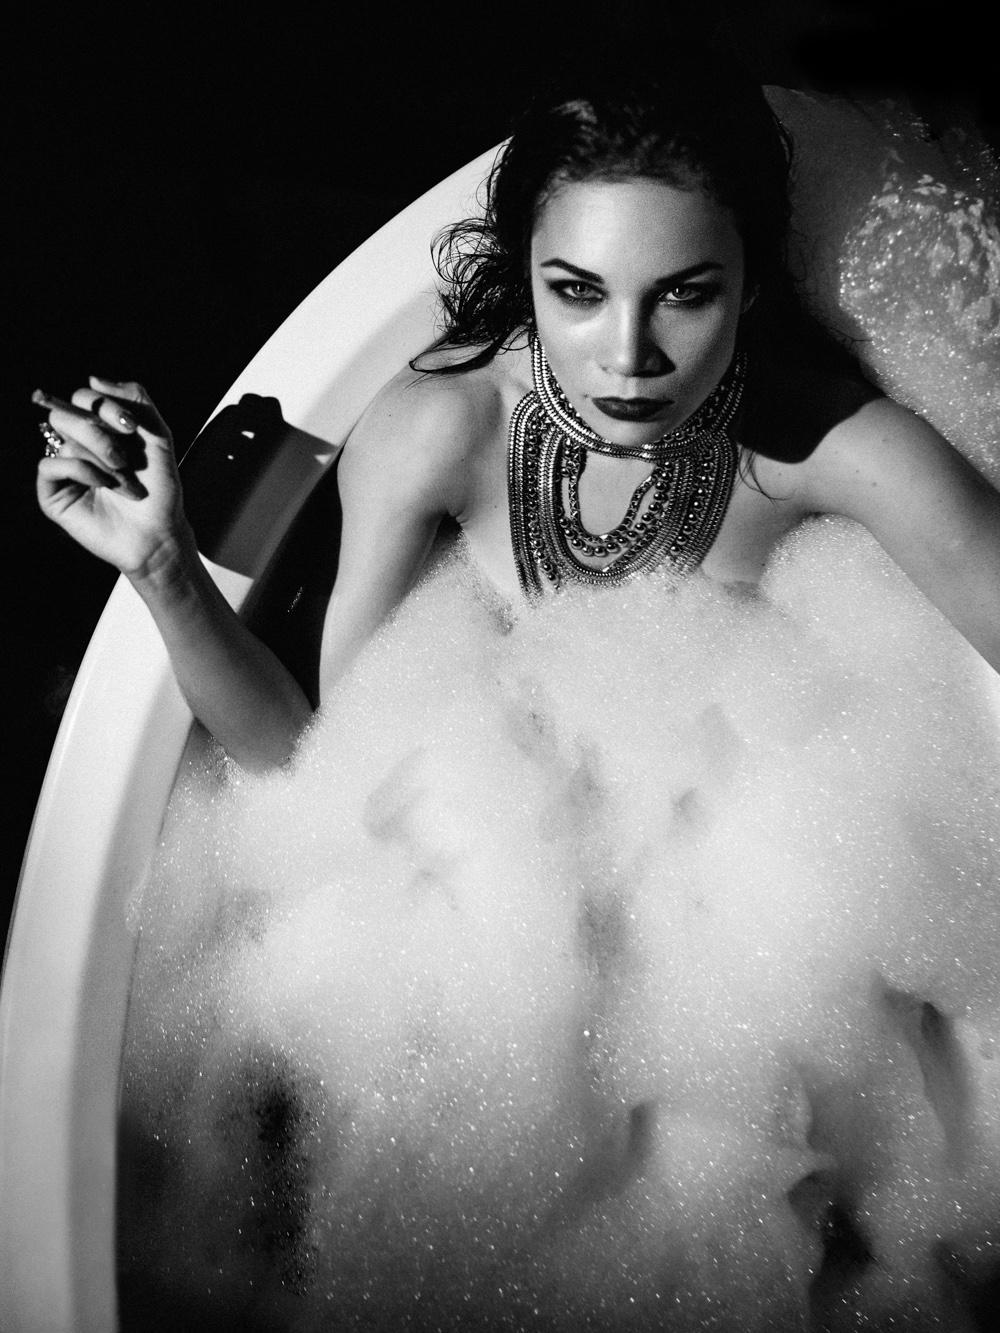 yulia-otroschenko-fashion-photographer-07